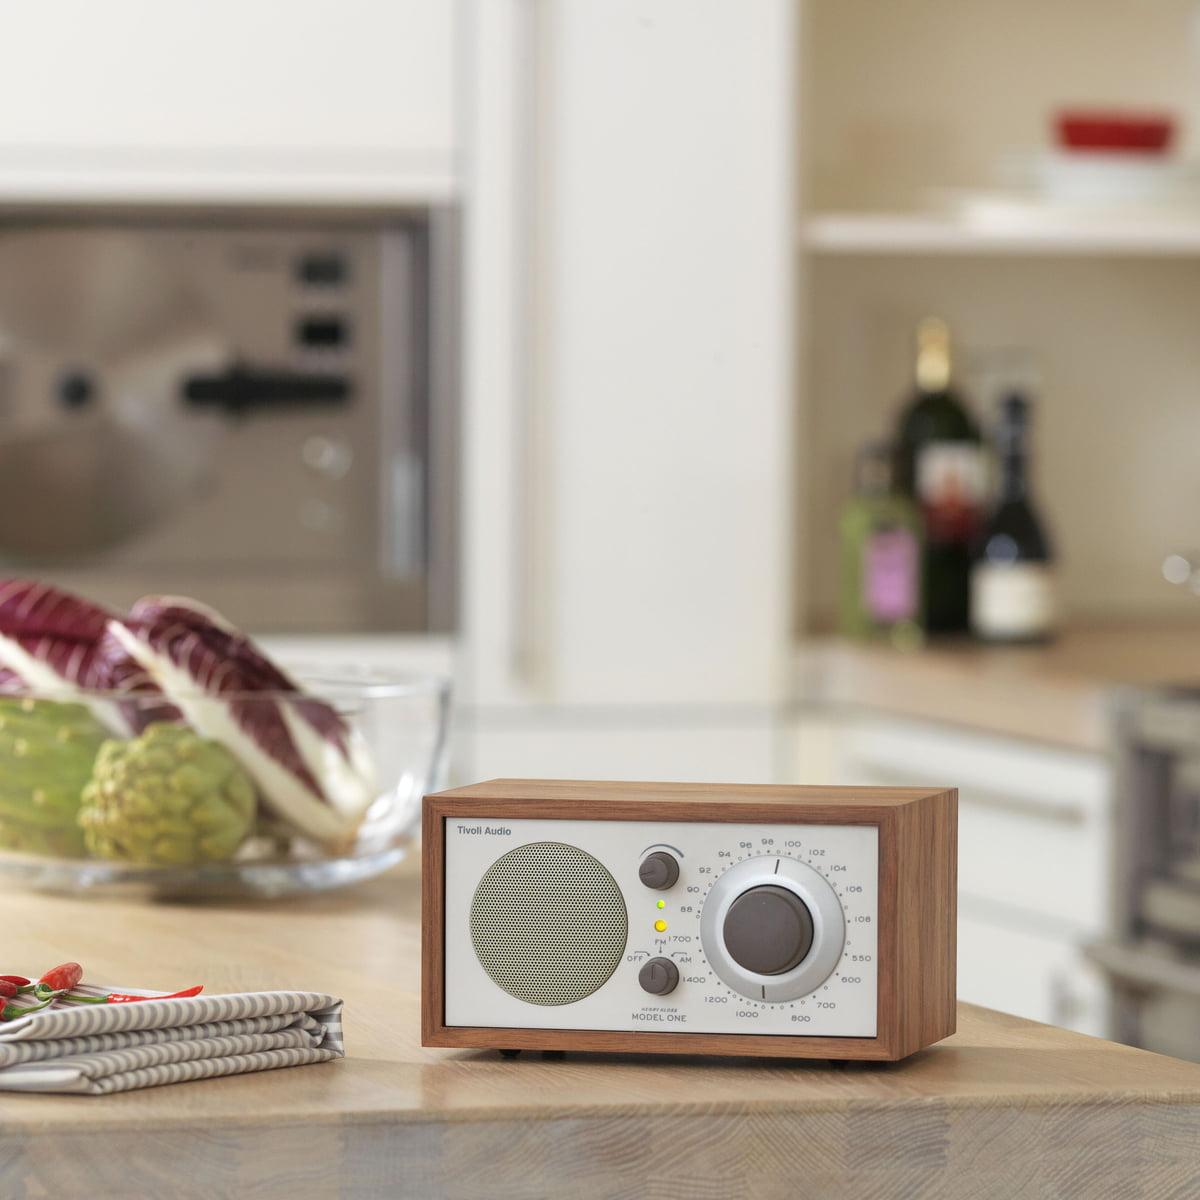 Model one by tivoli audio - Tivoli kitchenware ...